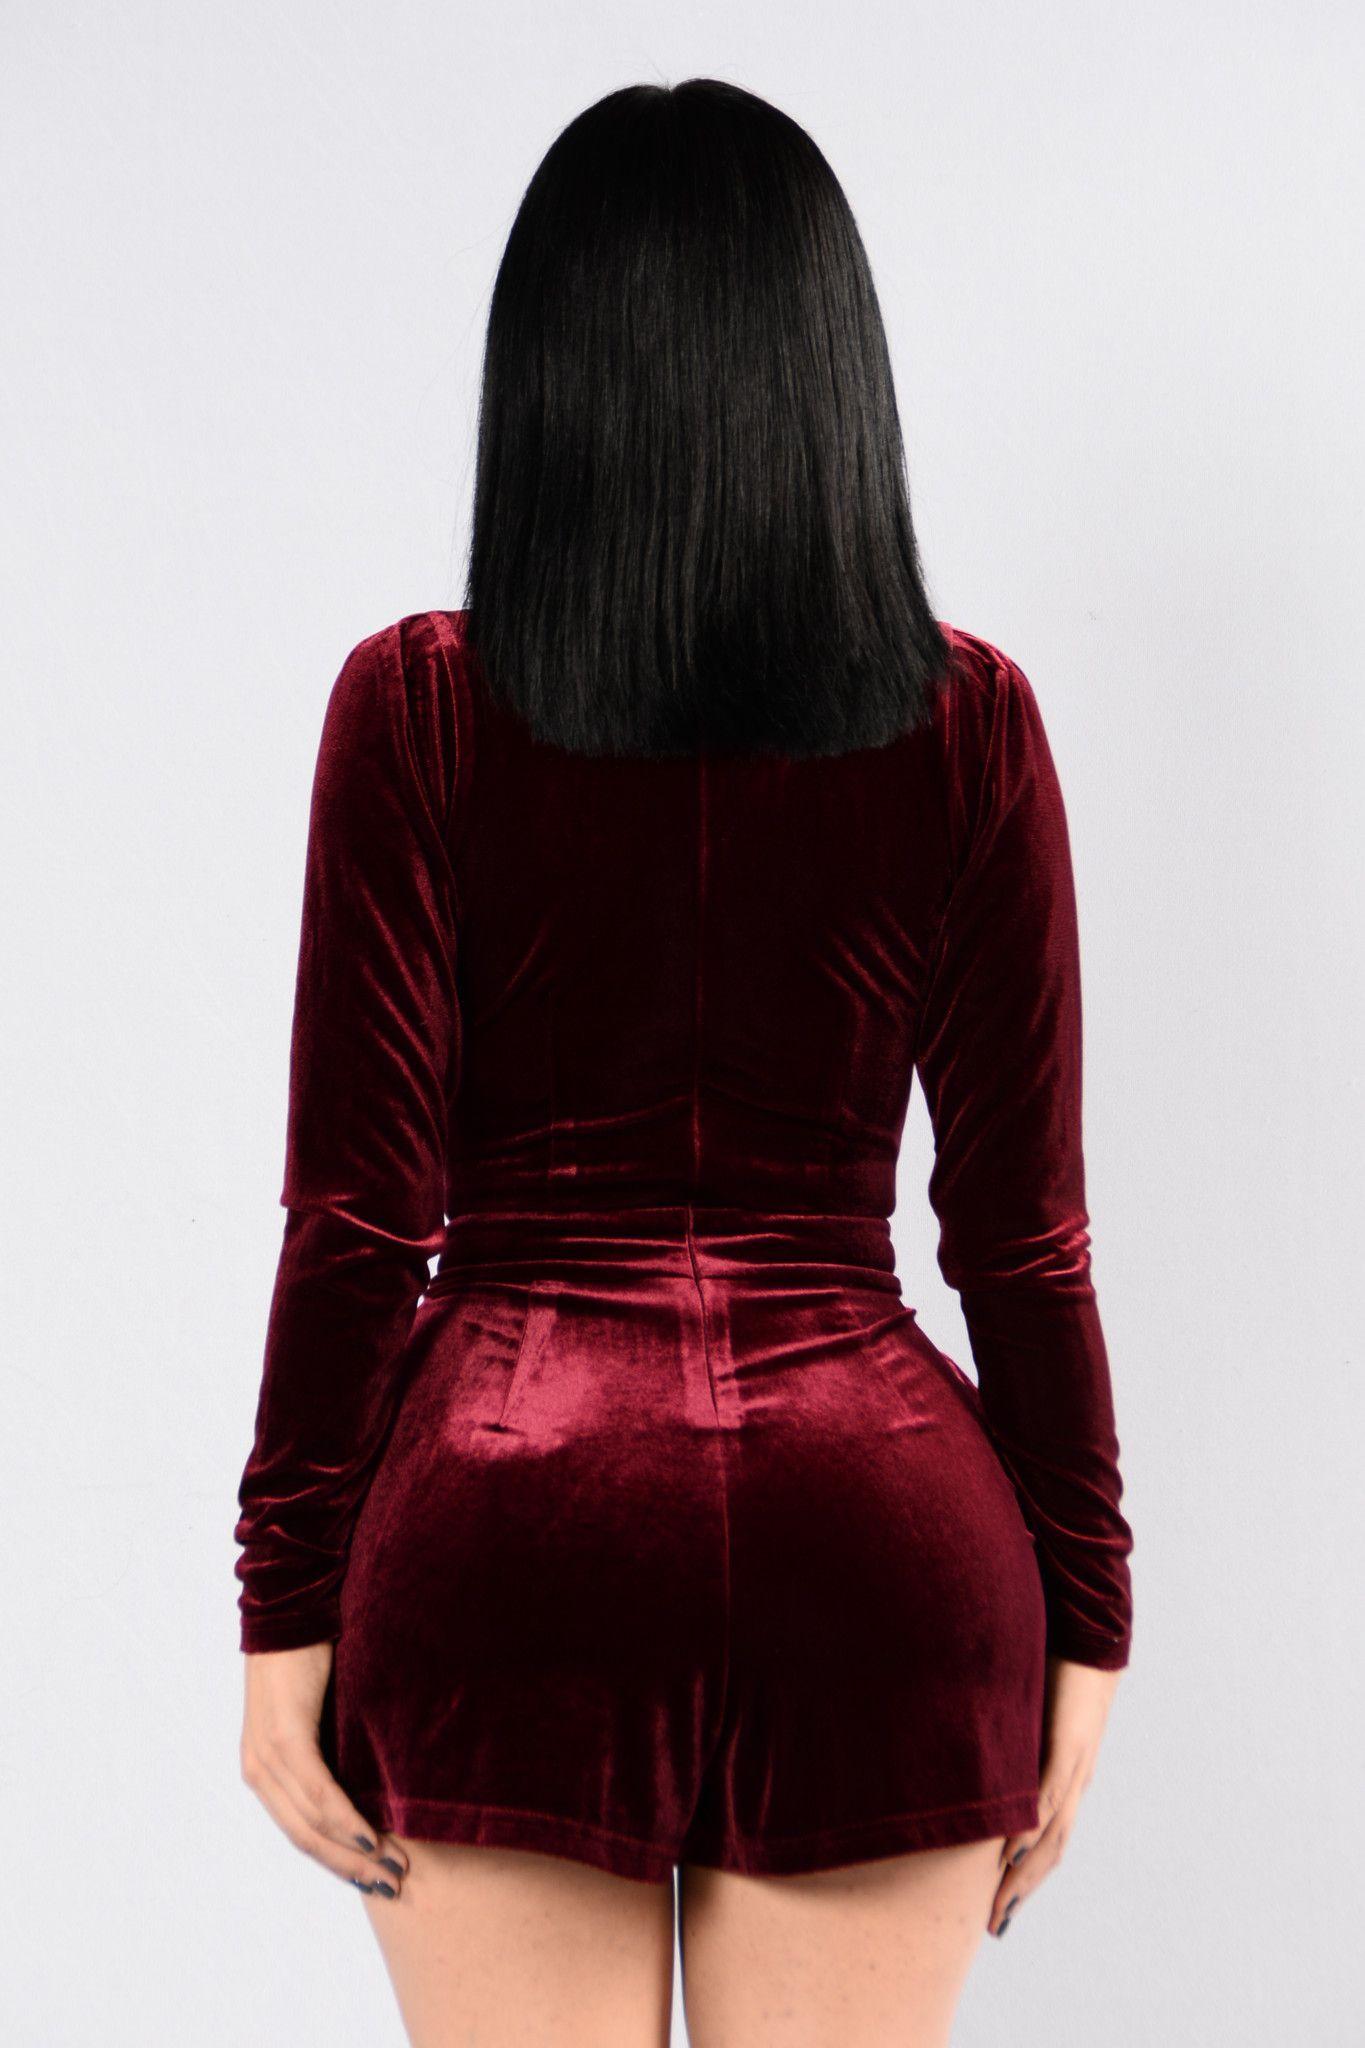 Available in Wine and Navy Velvet Romper Zipper Back Deep V Neckline Long Sleeve Side Pockets 95% Polyester 5% Spandex